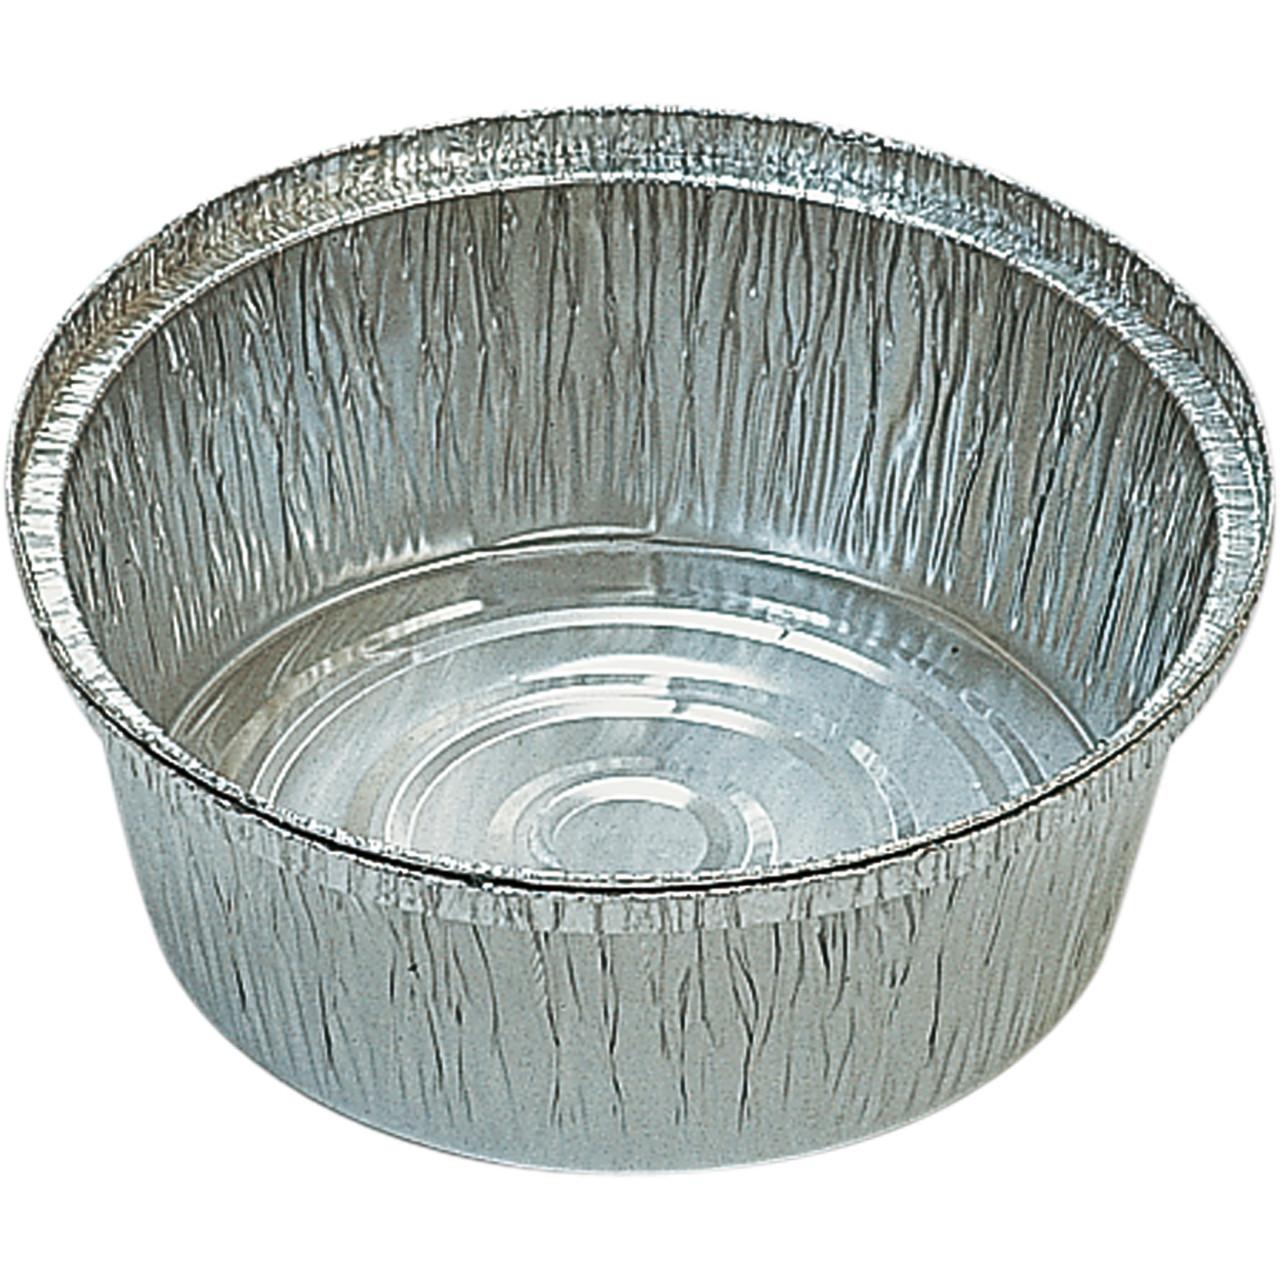 Safata alumini pollastre rodona 206x55mm